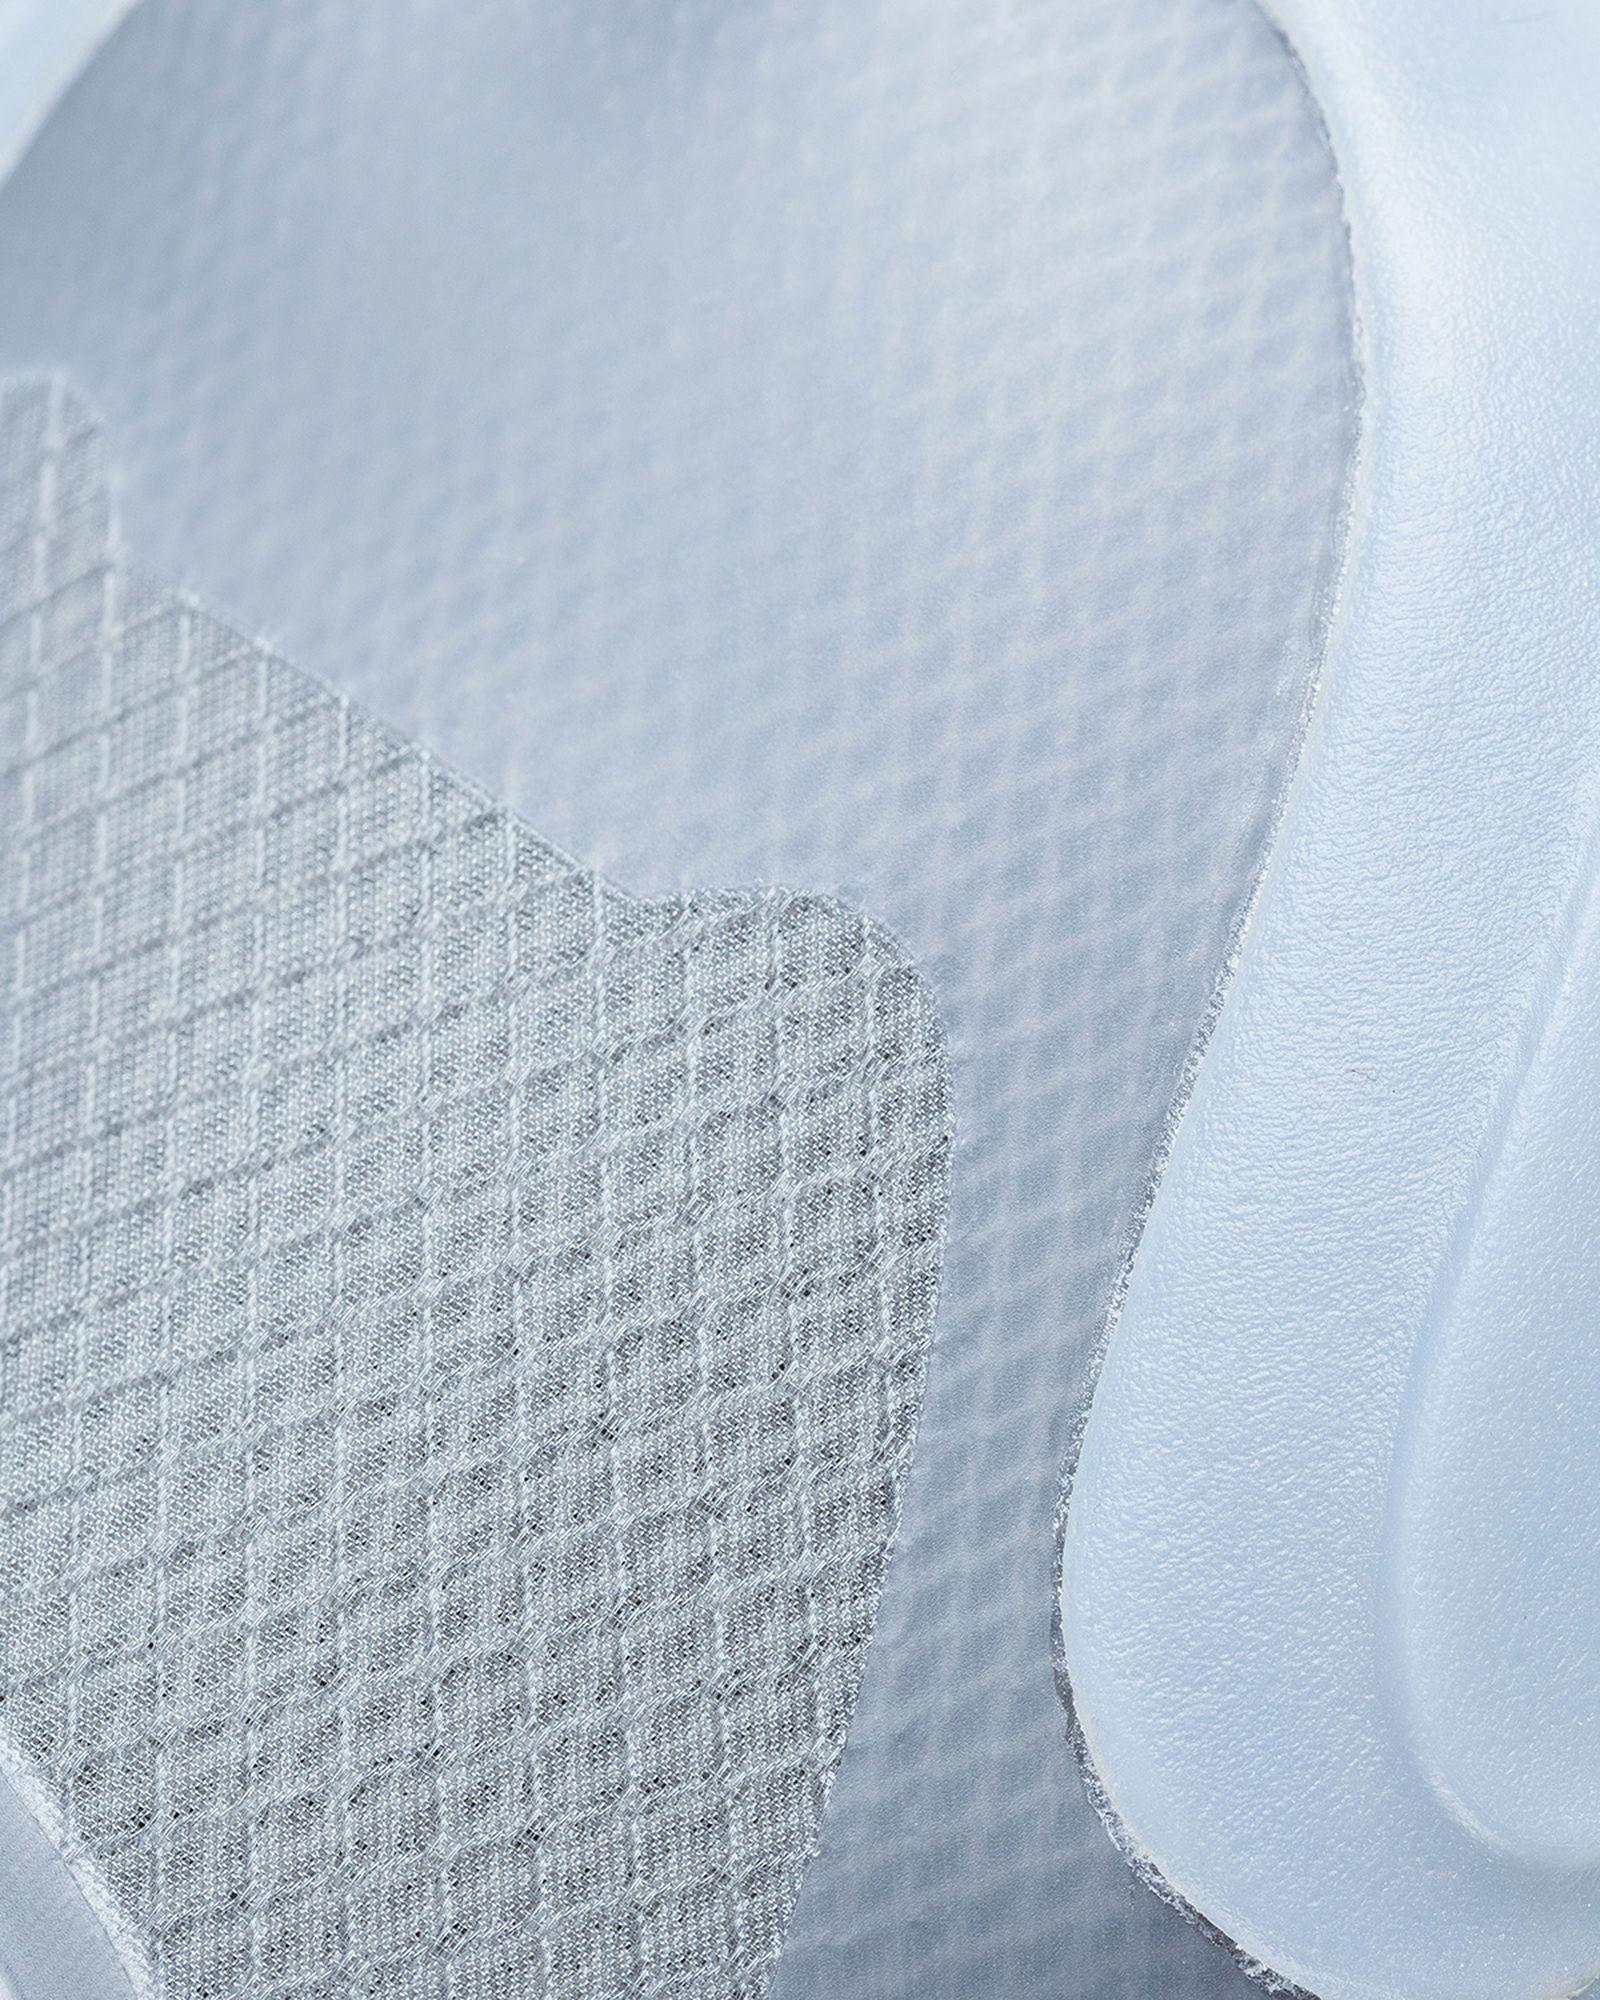 adidas-prada-luna-rossa-replica-grey-release-date-price-6